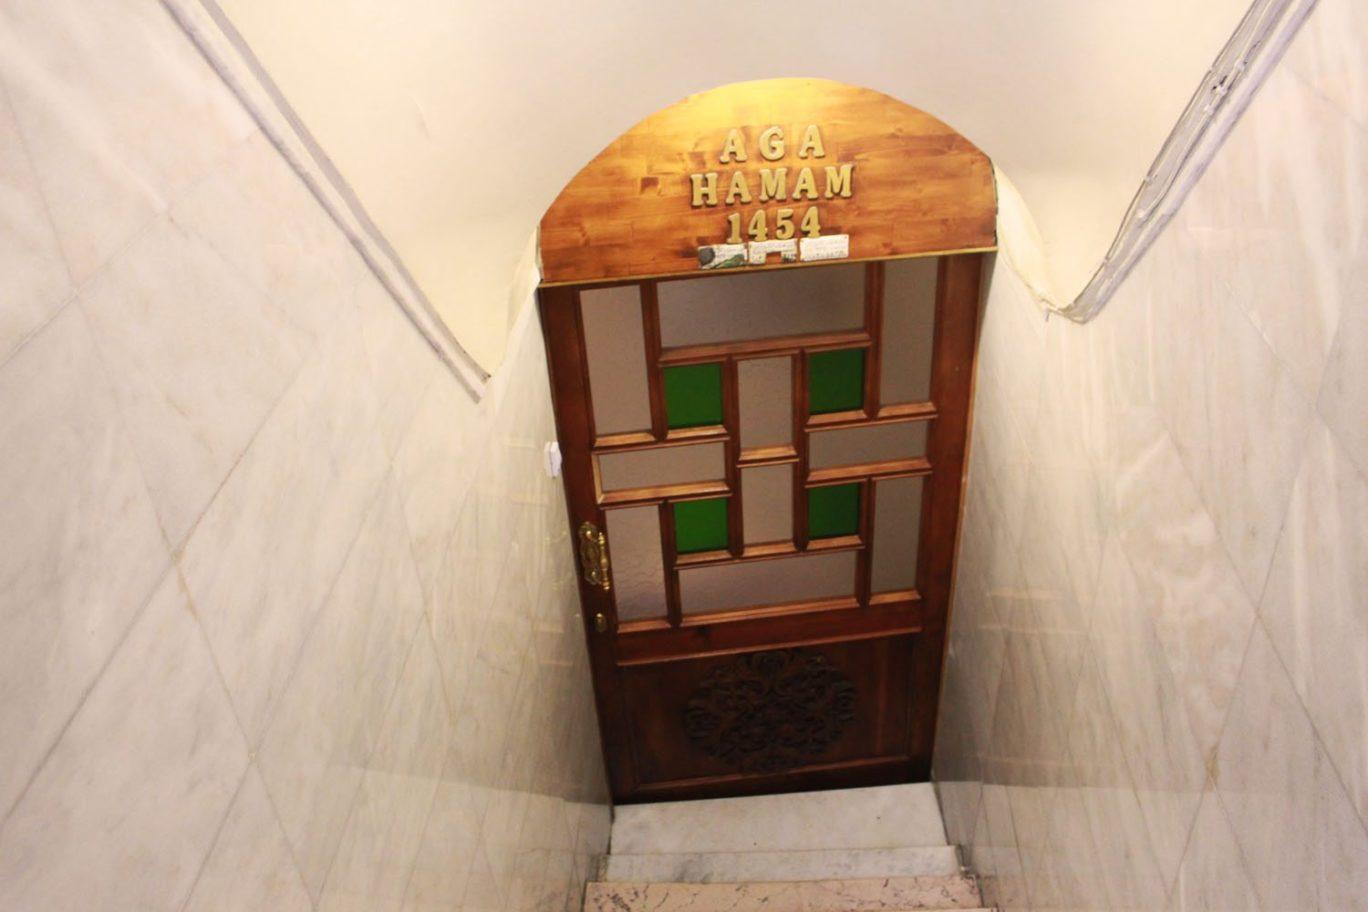 aga hamami door 1454 oldest turkish spa in istanbuk